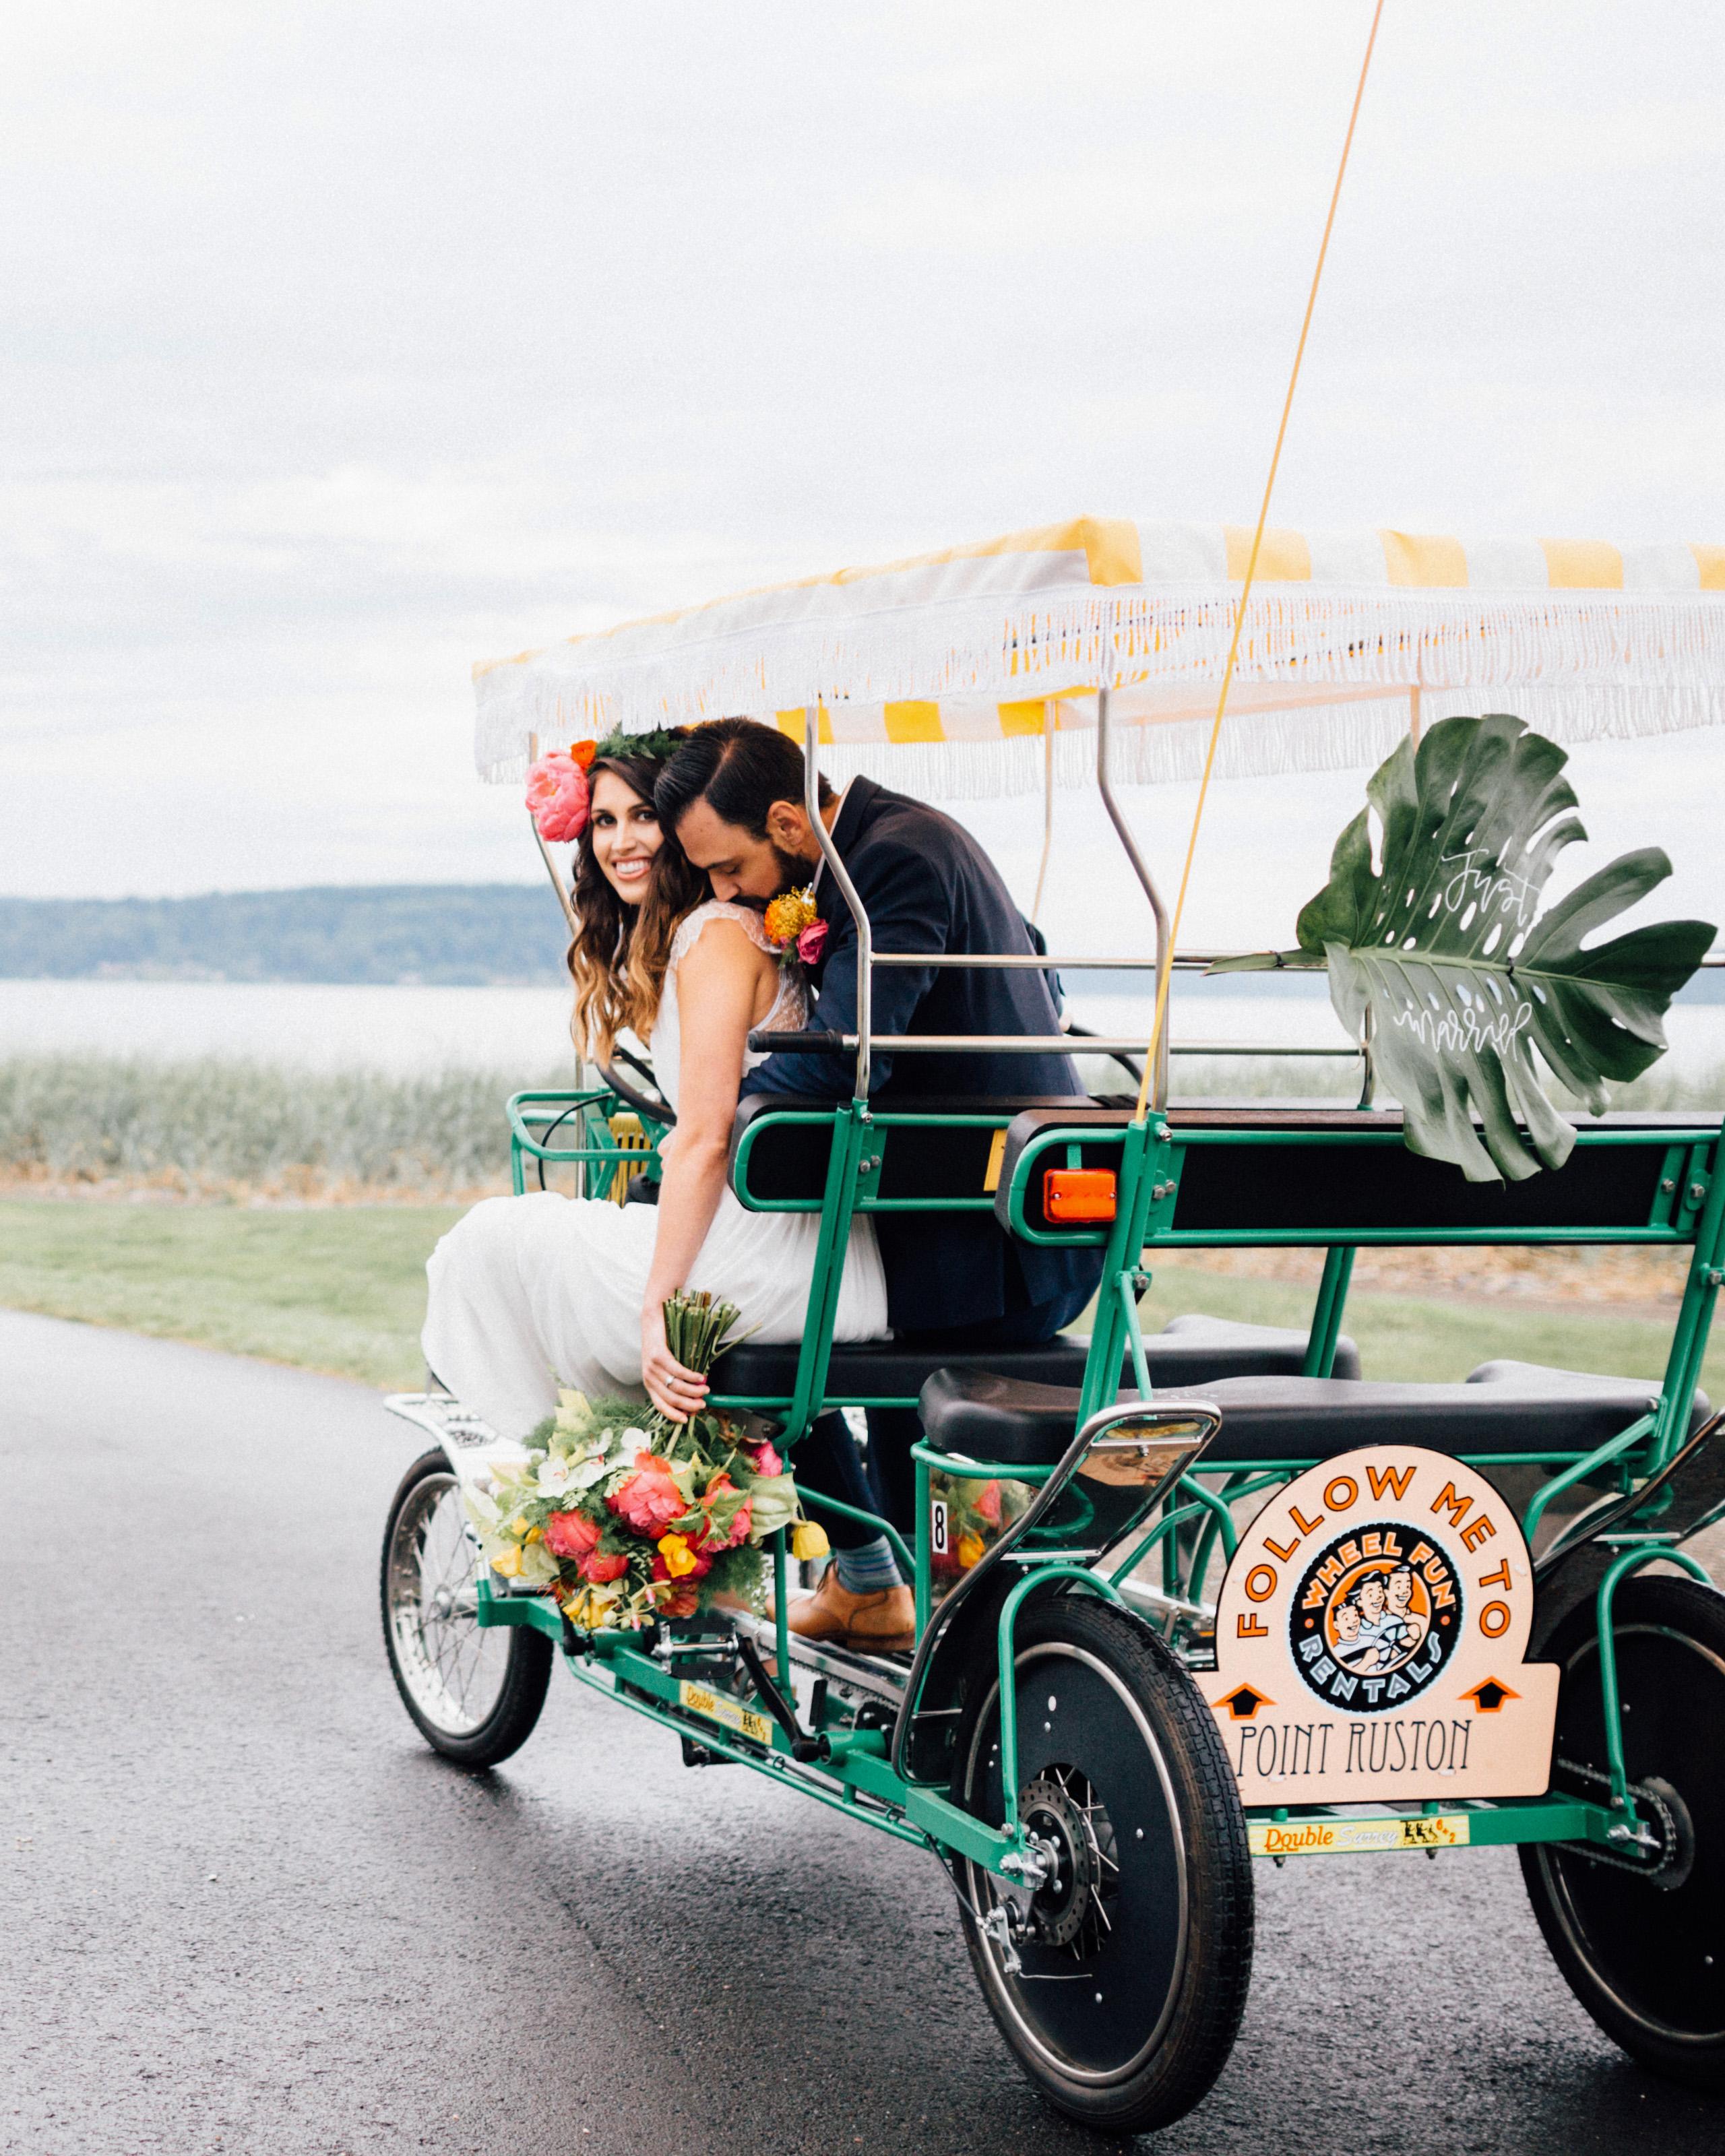 wedding exits surrey bike